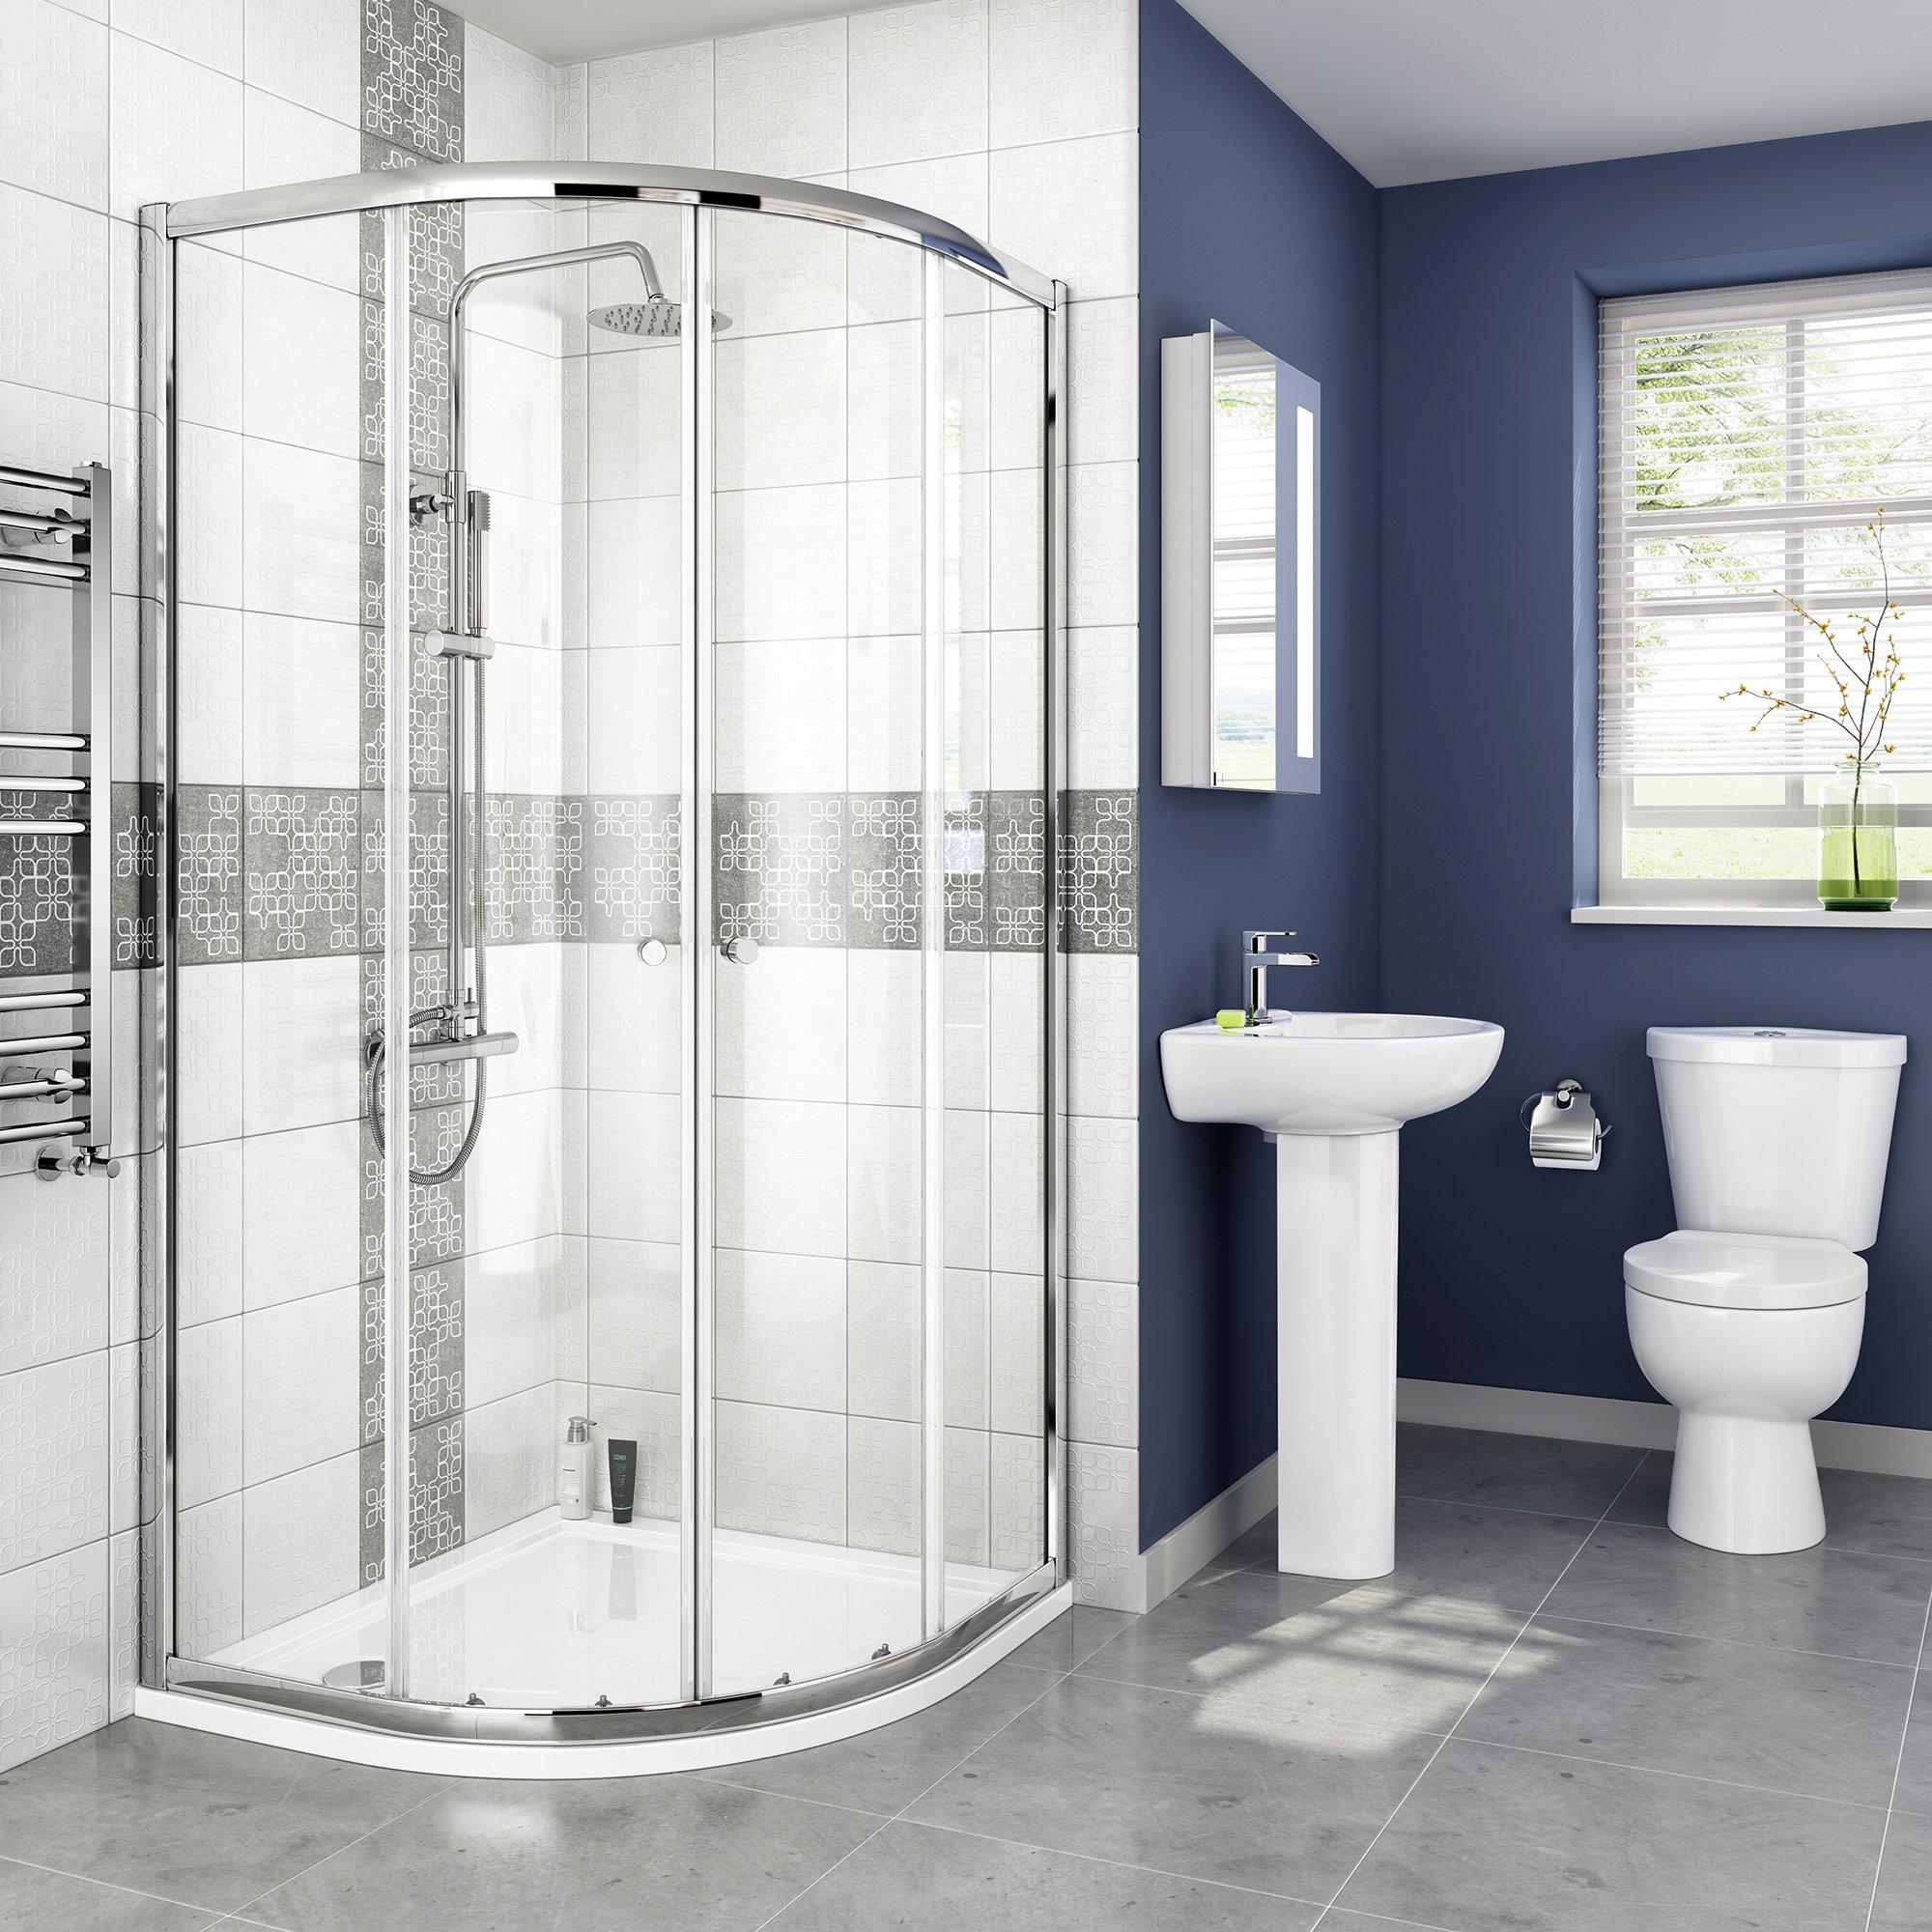 Quadrant Shower Enclosure: Amazon.co.uk